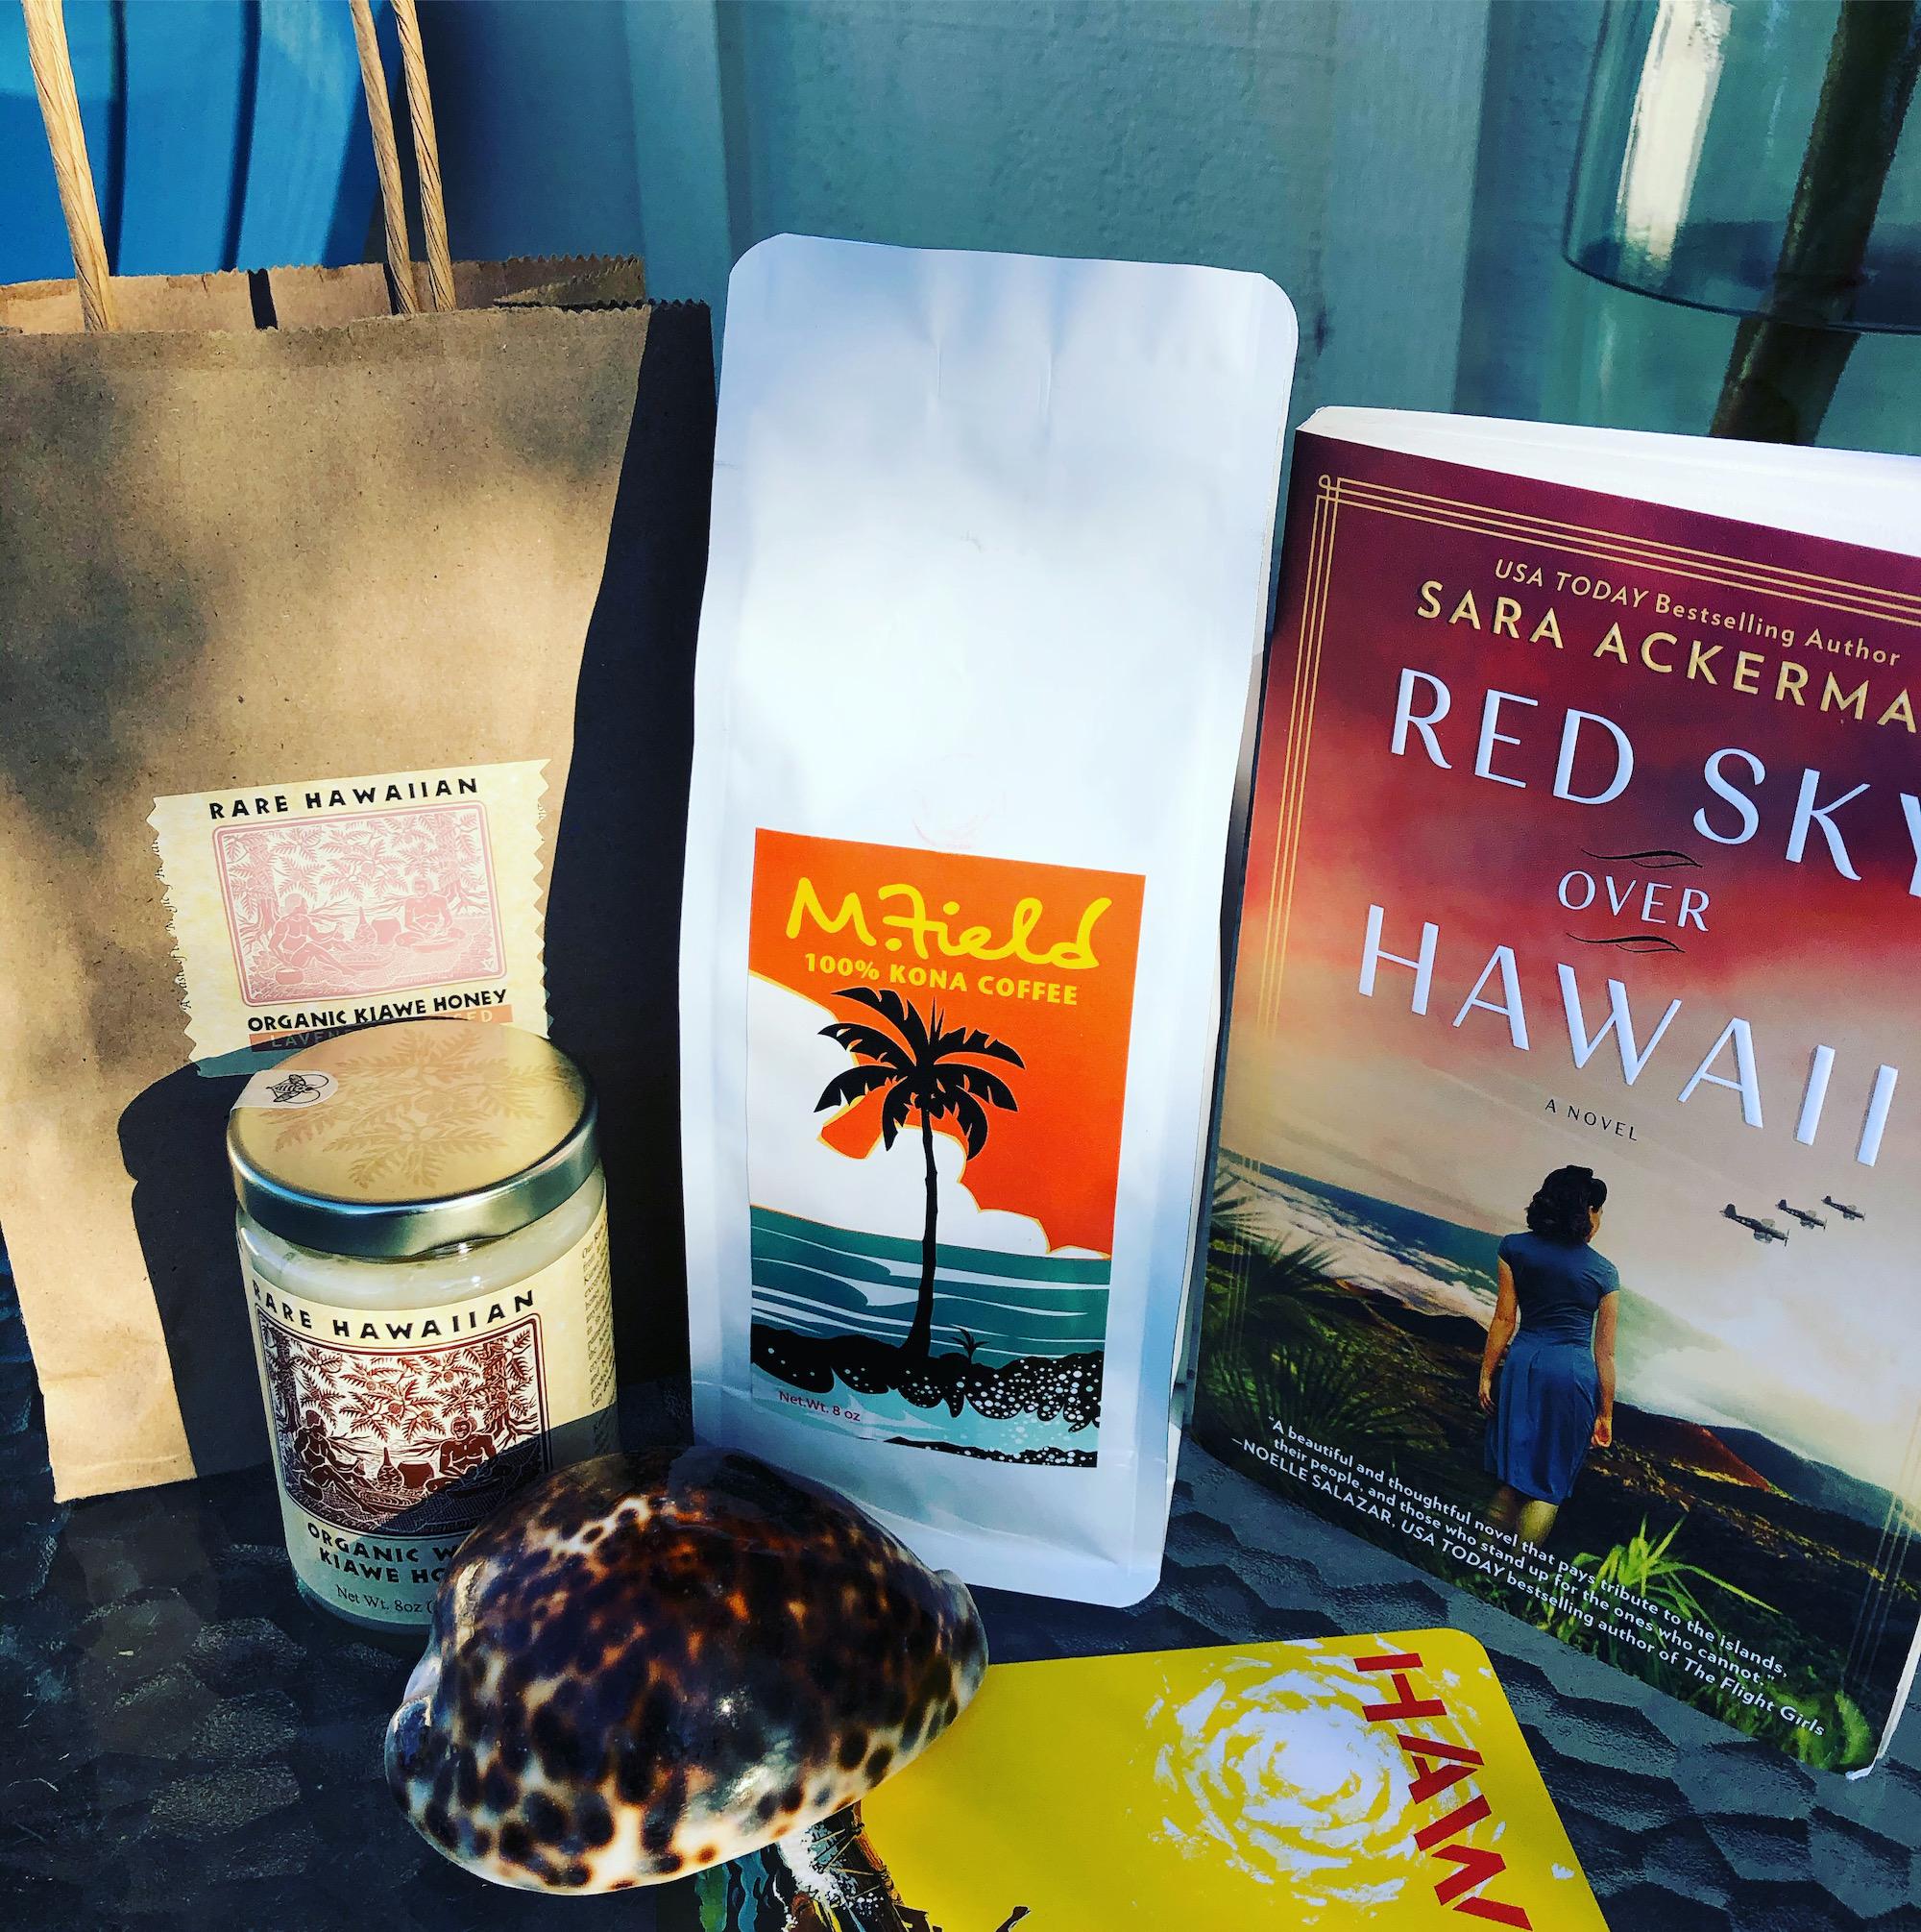 Red Sky Over Hawaii book by Sara Ackerman